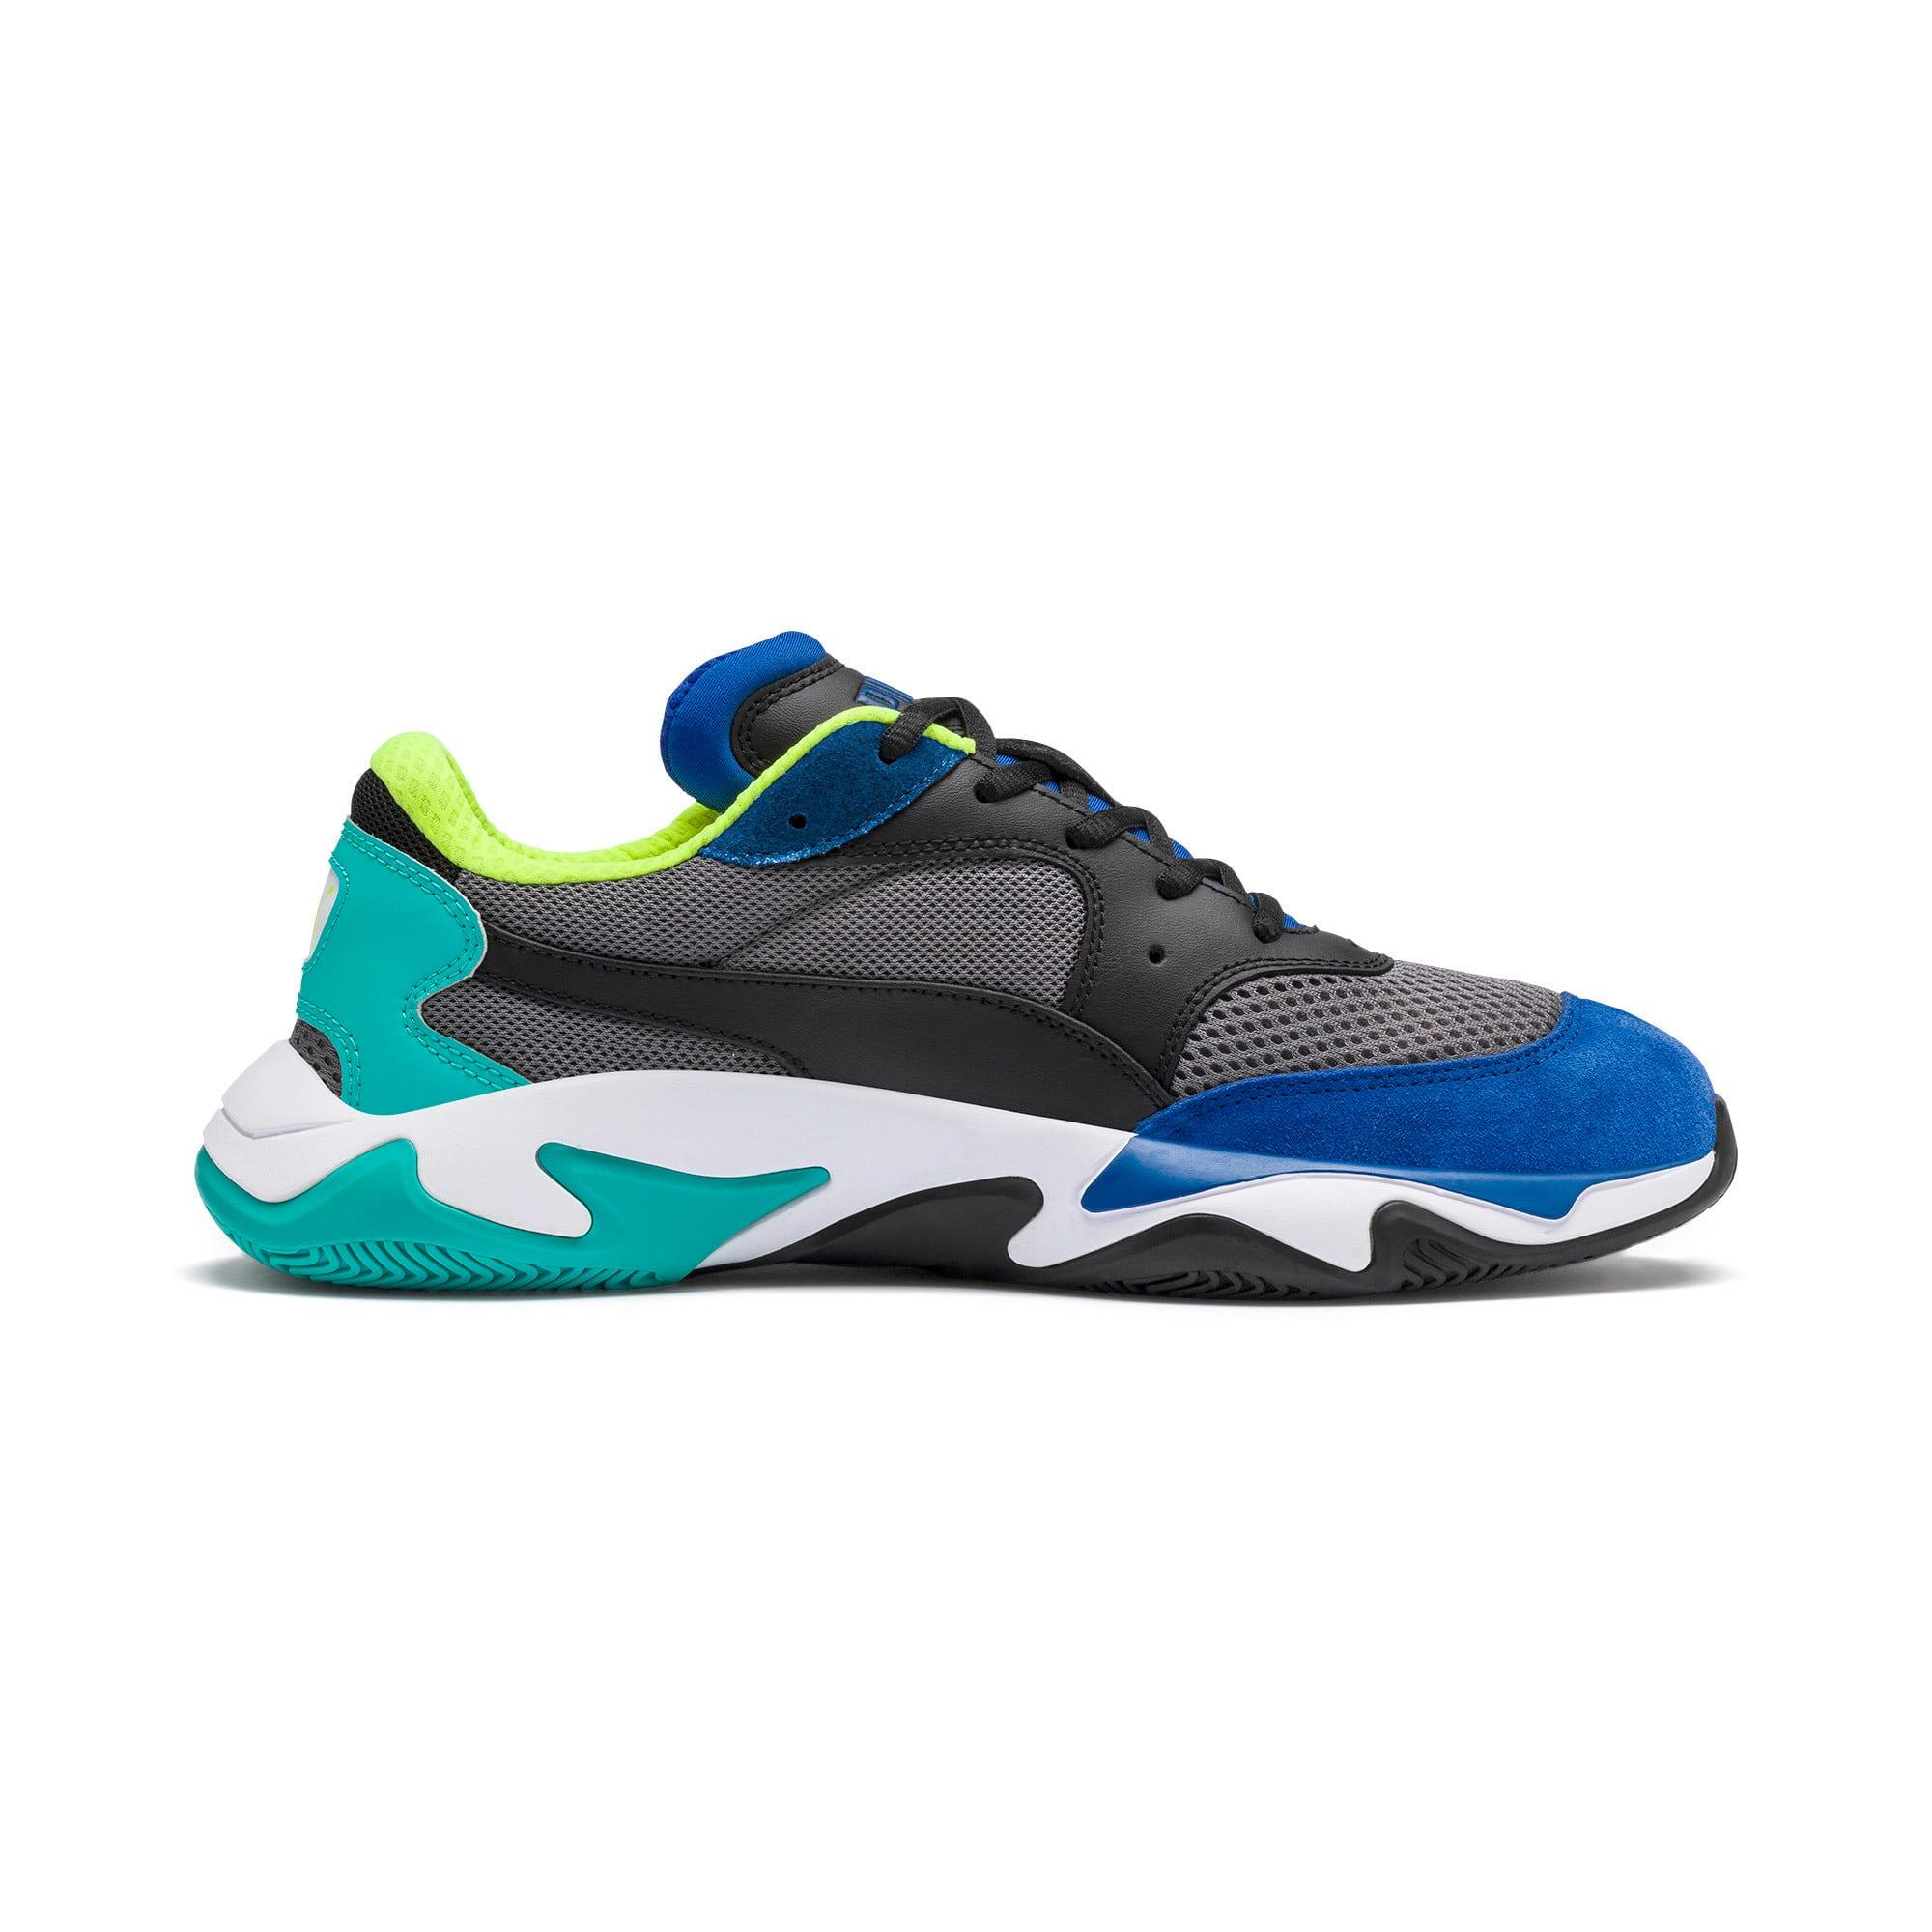 Thumbnail 6 of Storm Origin Sneaker, Galaxy Blue-CASTLEROCK, medium